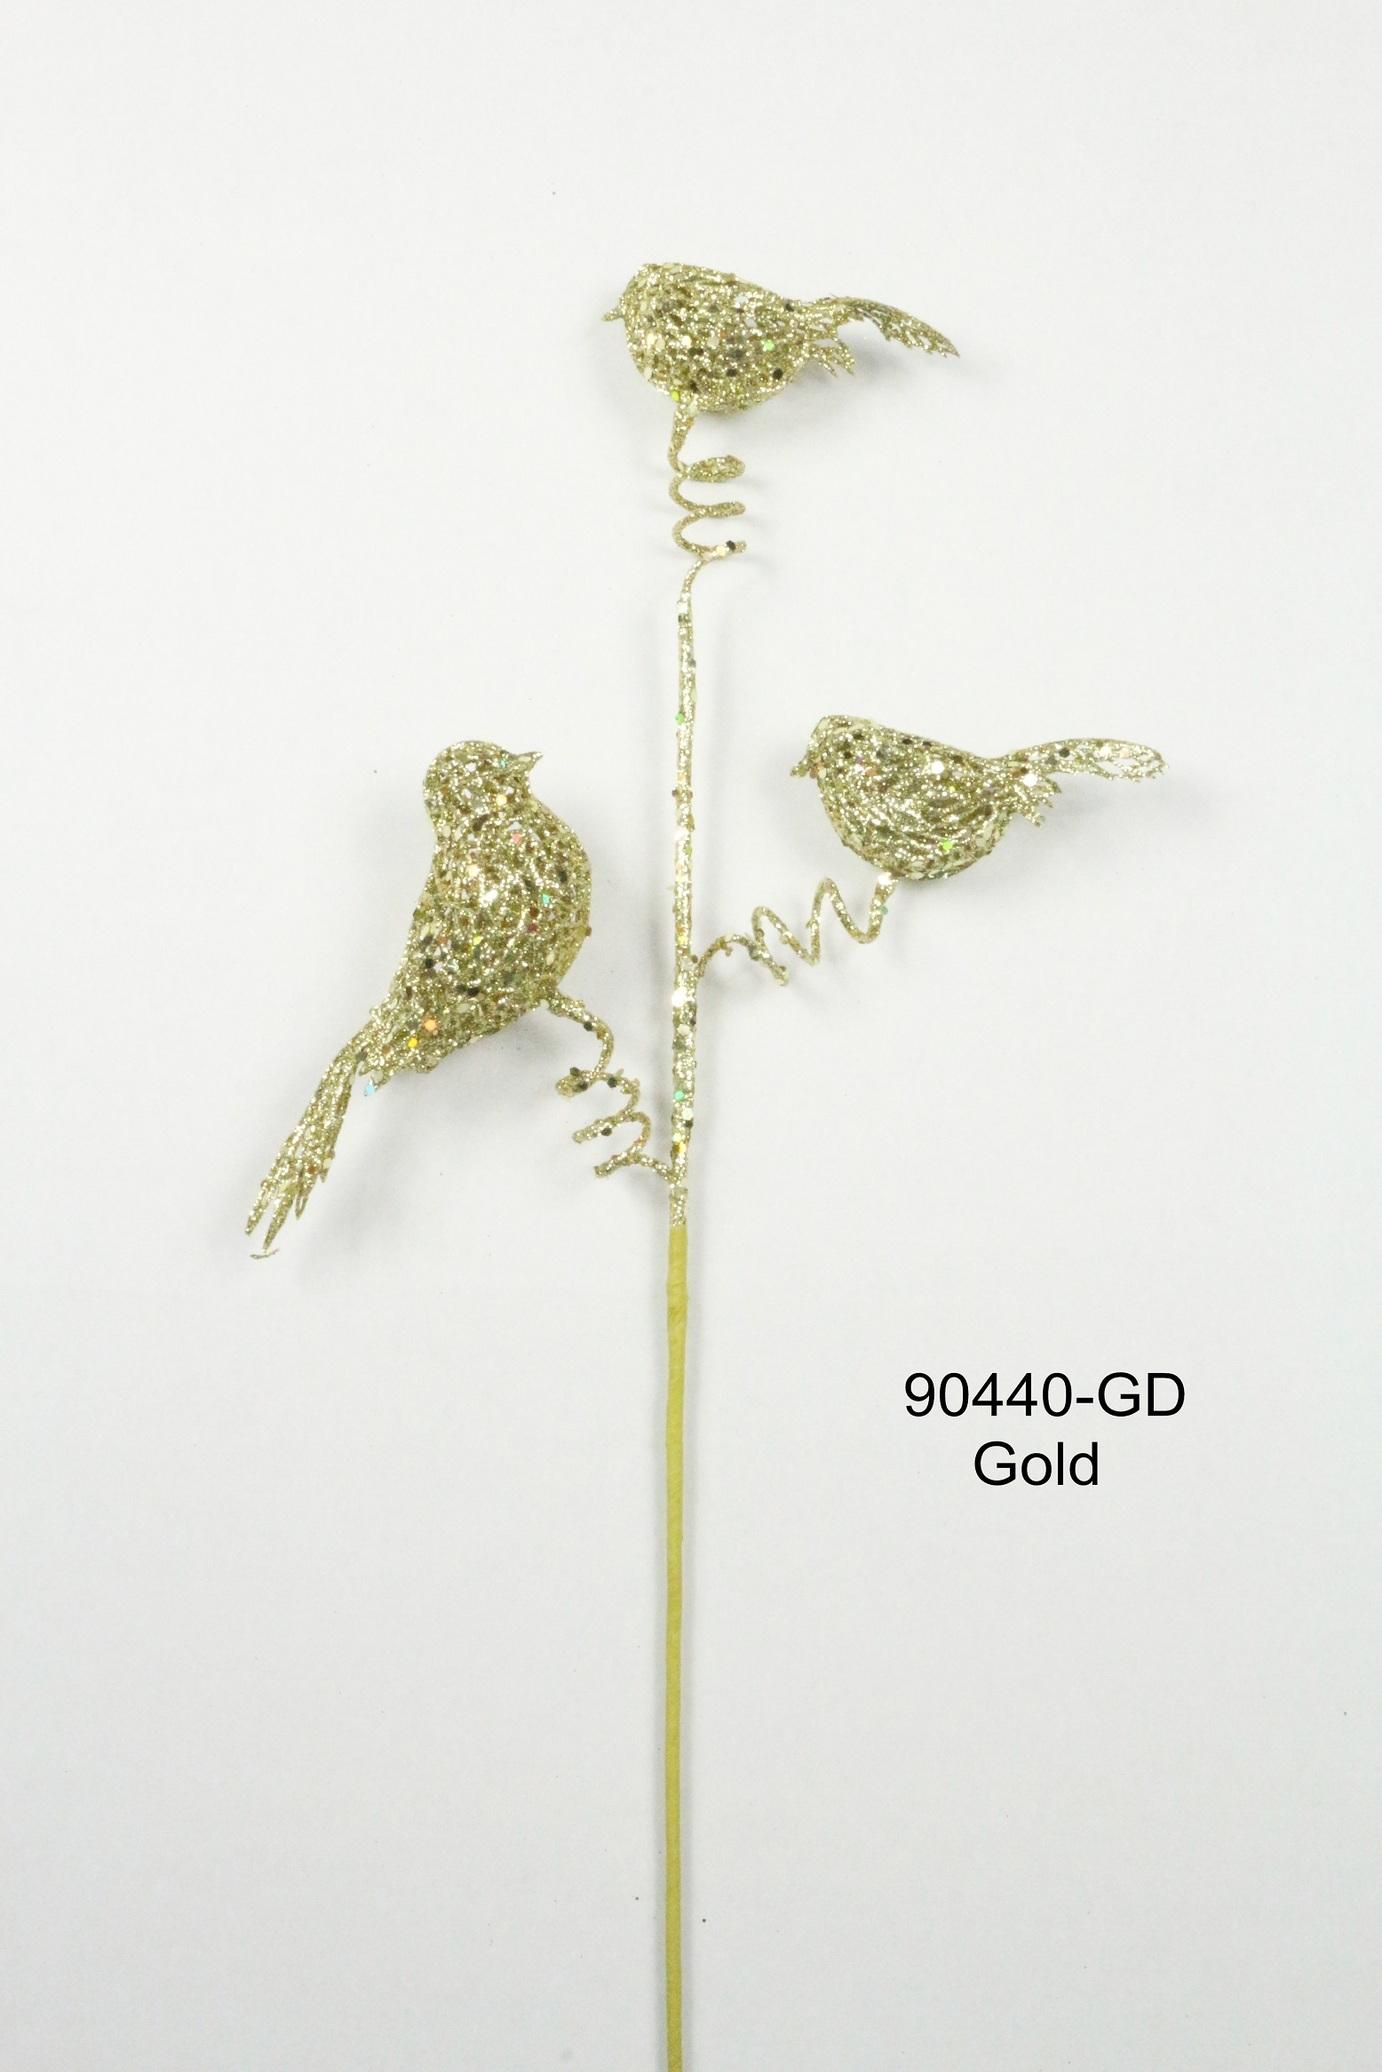 90440-GD